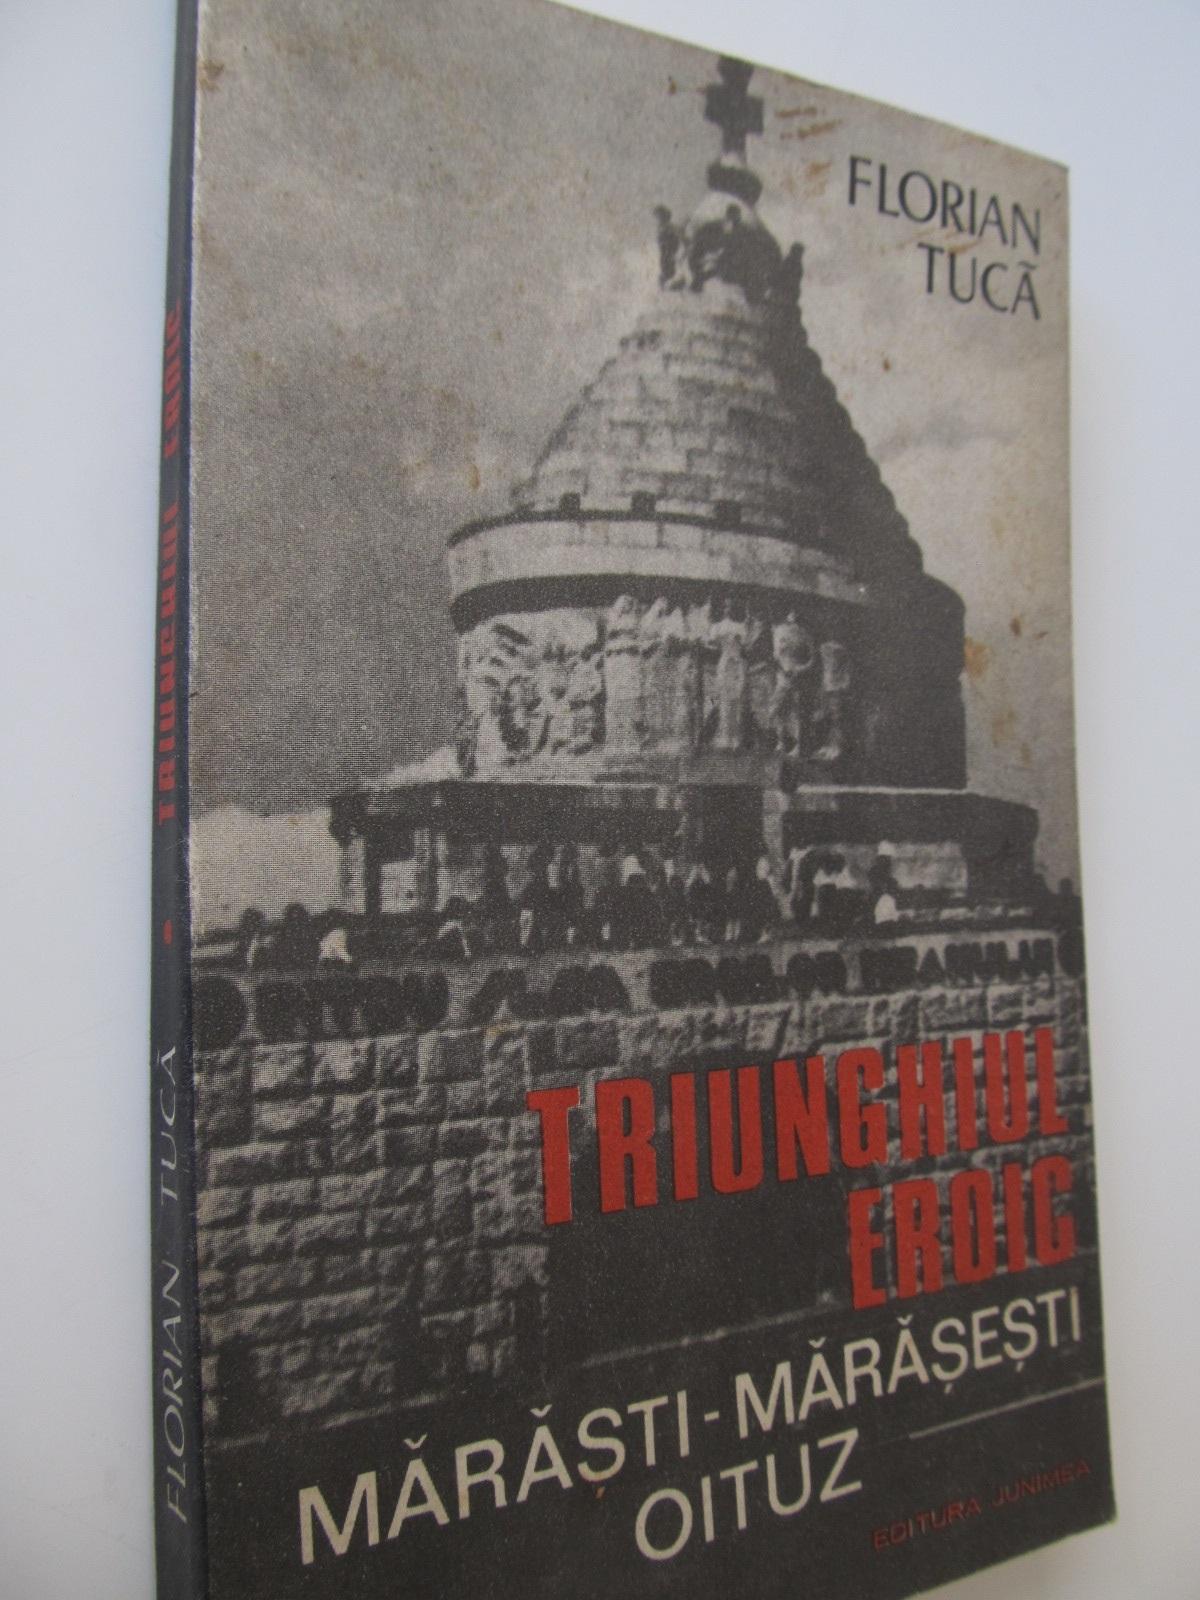 Triunghiul eroic Marasti Marasesti Oituz - Florian Tuca | Detalii carte